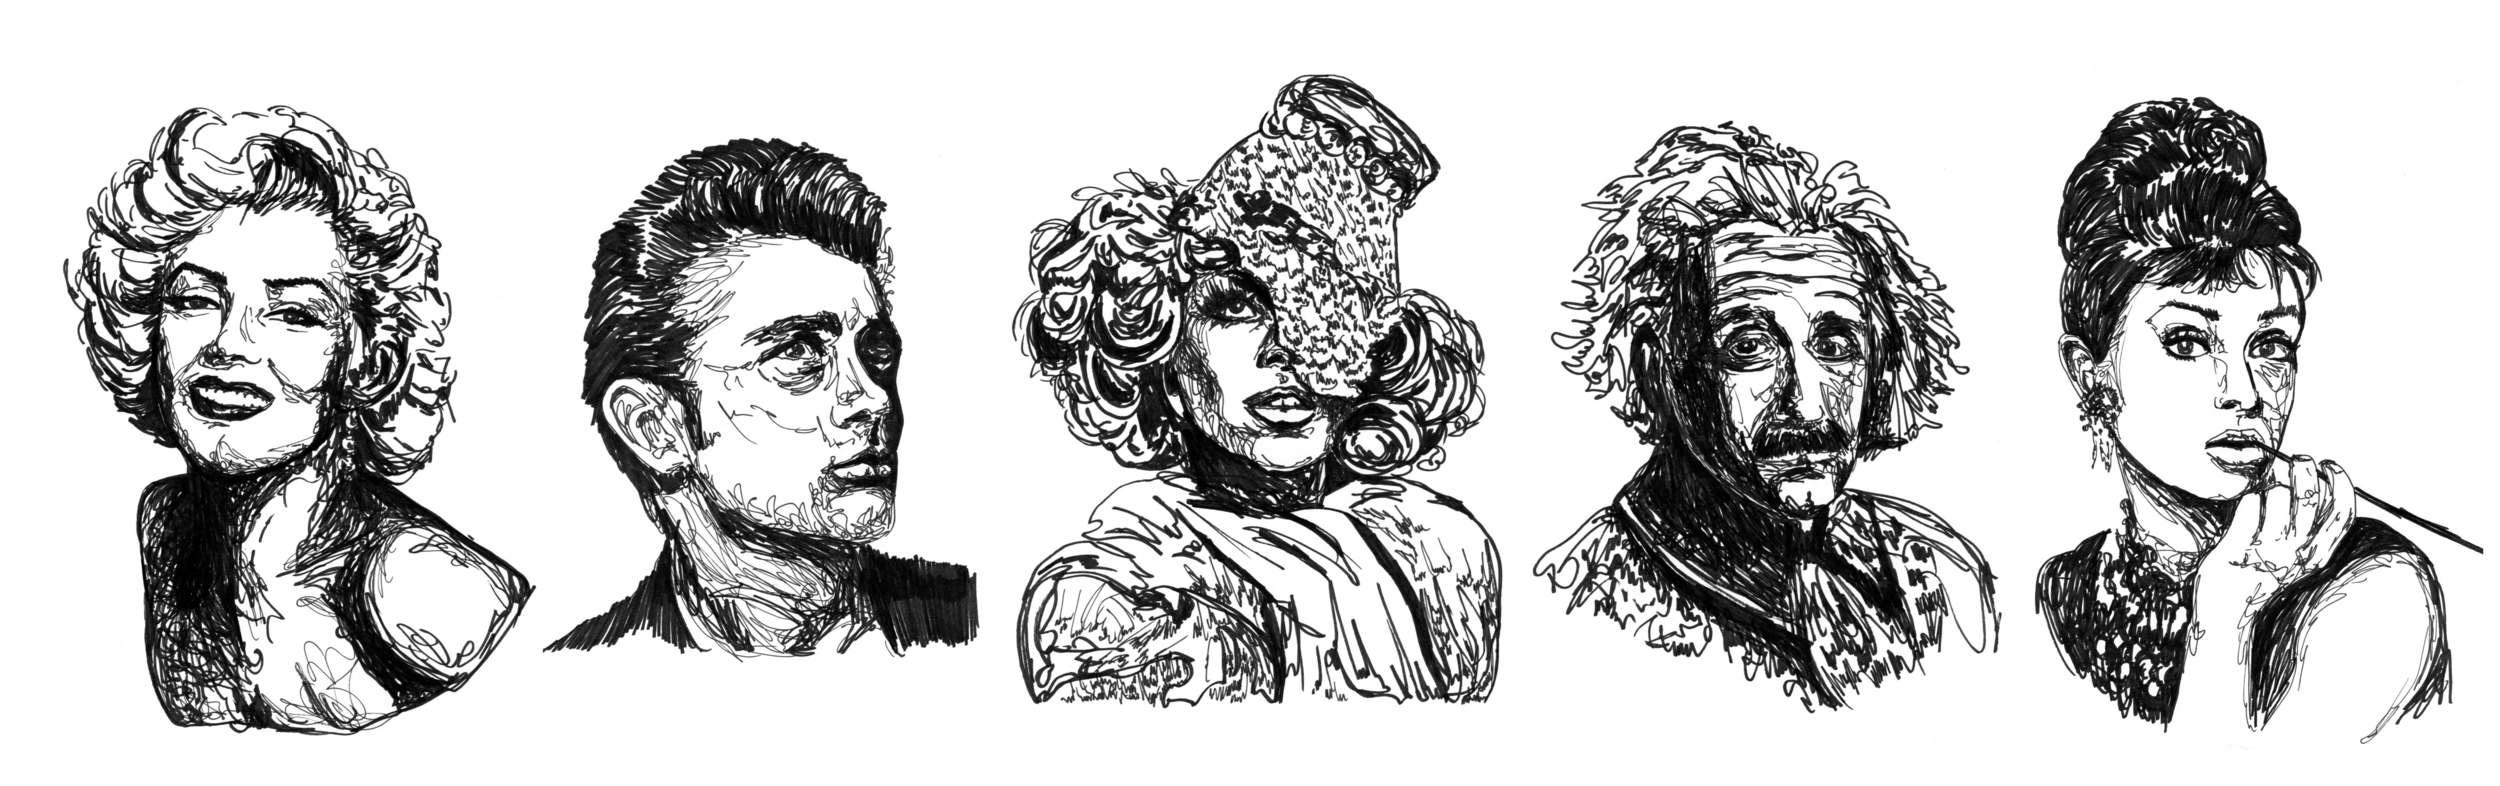 Becca Famous People Line Drawings 2013 - Web.jpg